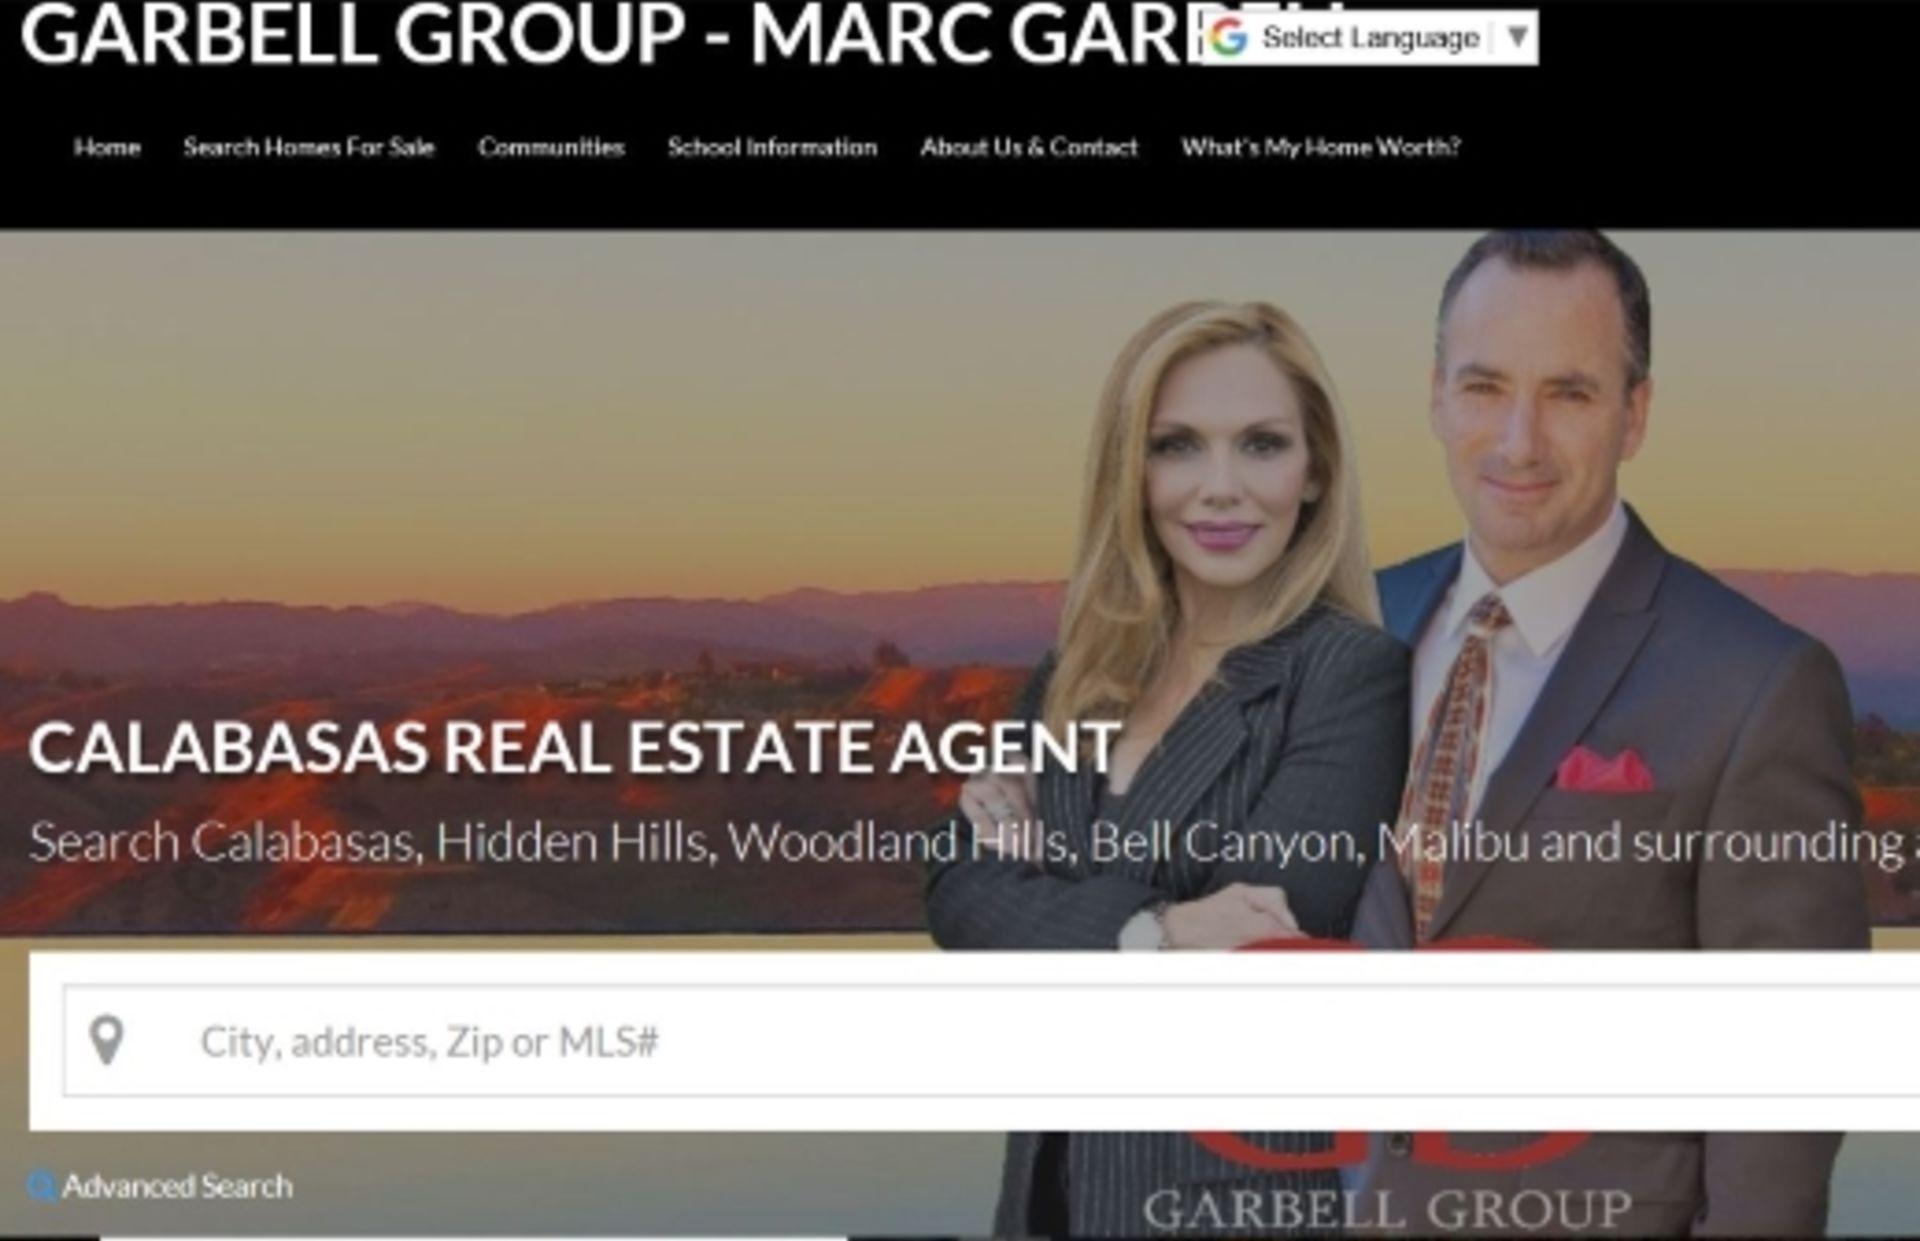 Calabasas Real Estate Agent